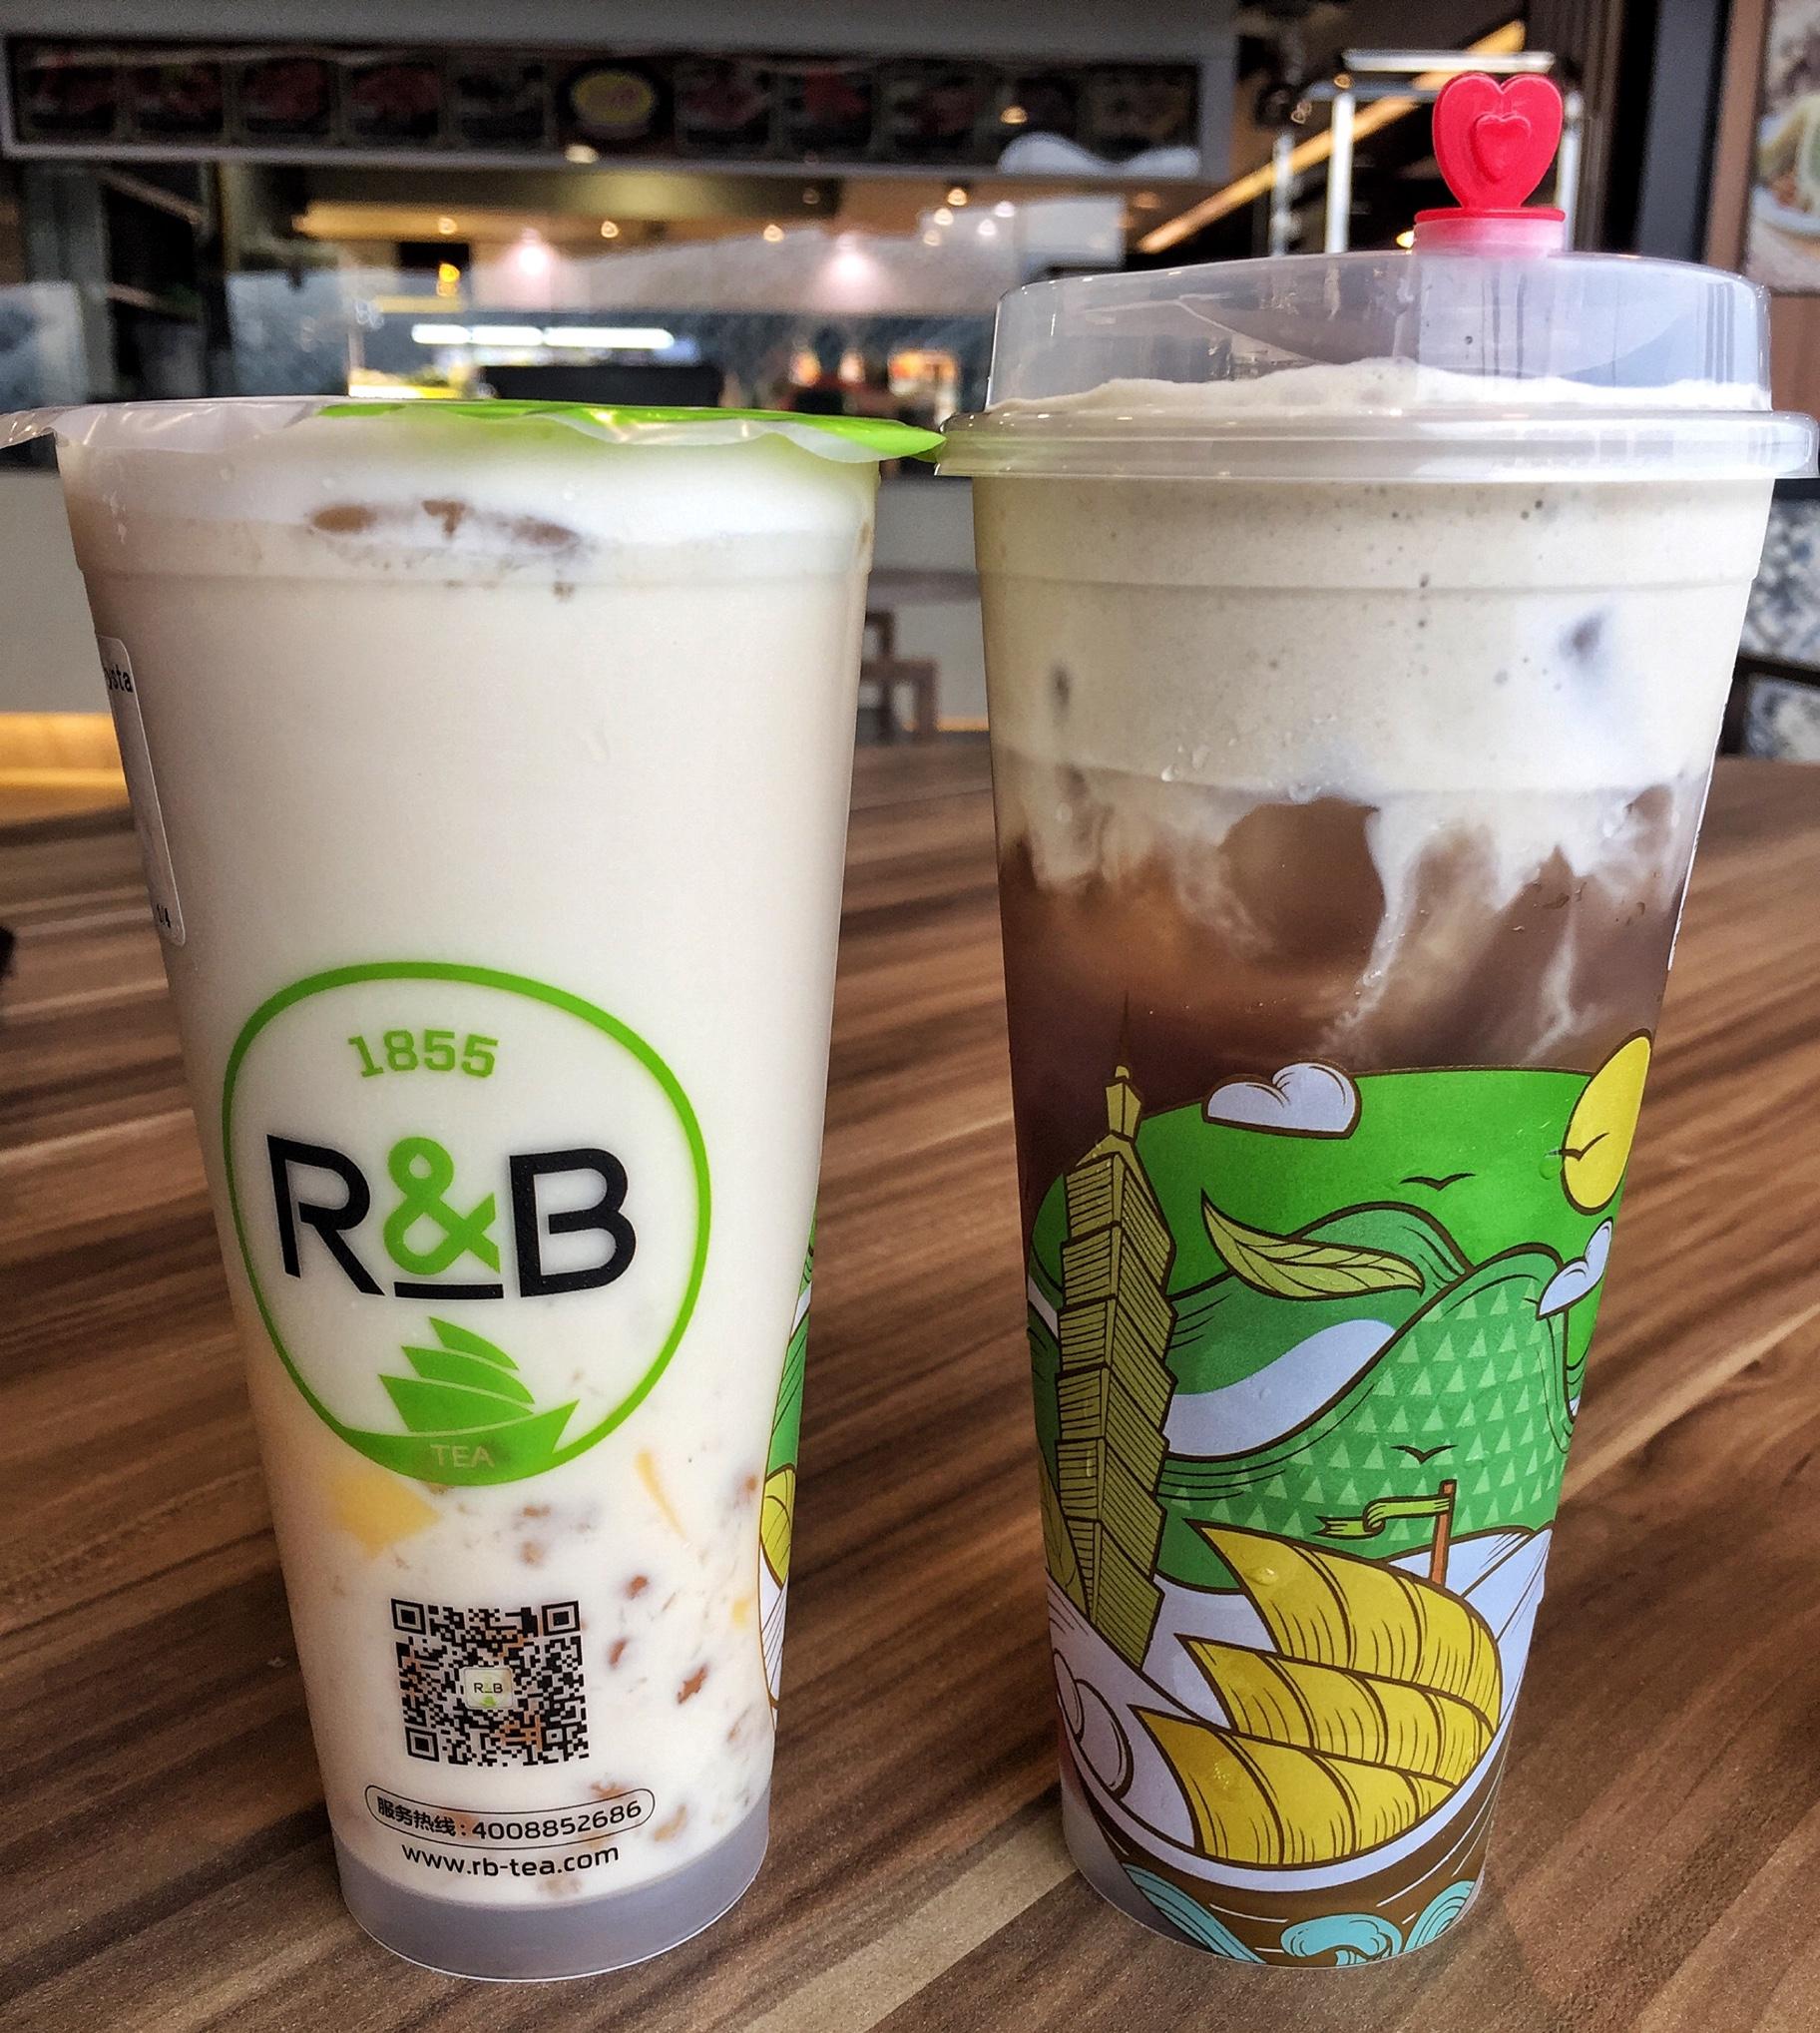 No. 23 Oolong Crystal Milk Tea ($3.80) & Roasted Oolong Tea ($4.50 for L, comes with Tea Cream)